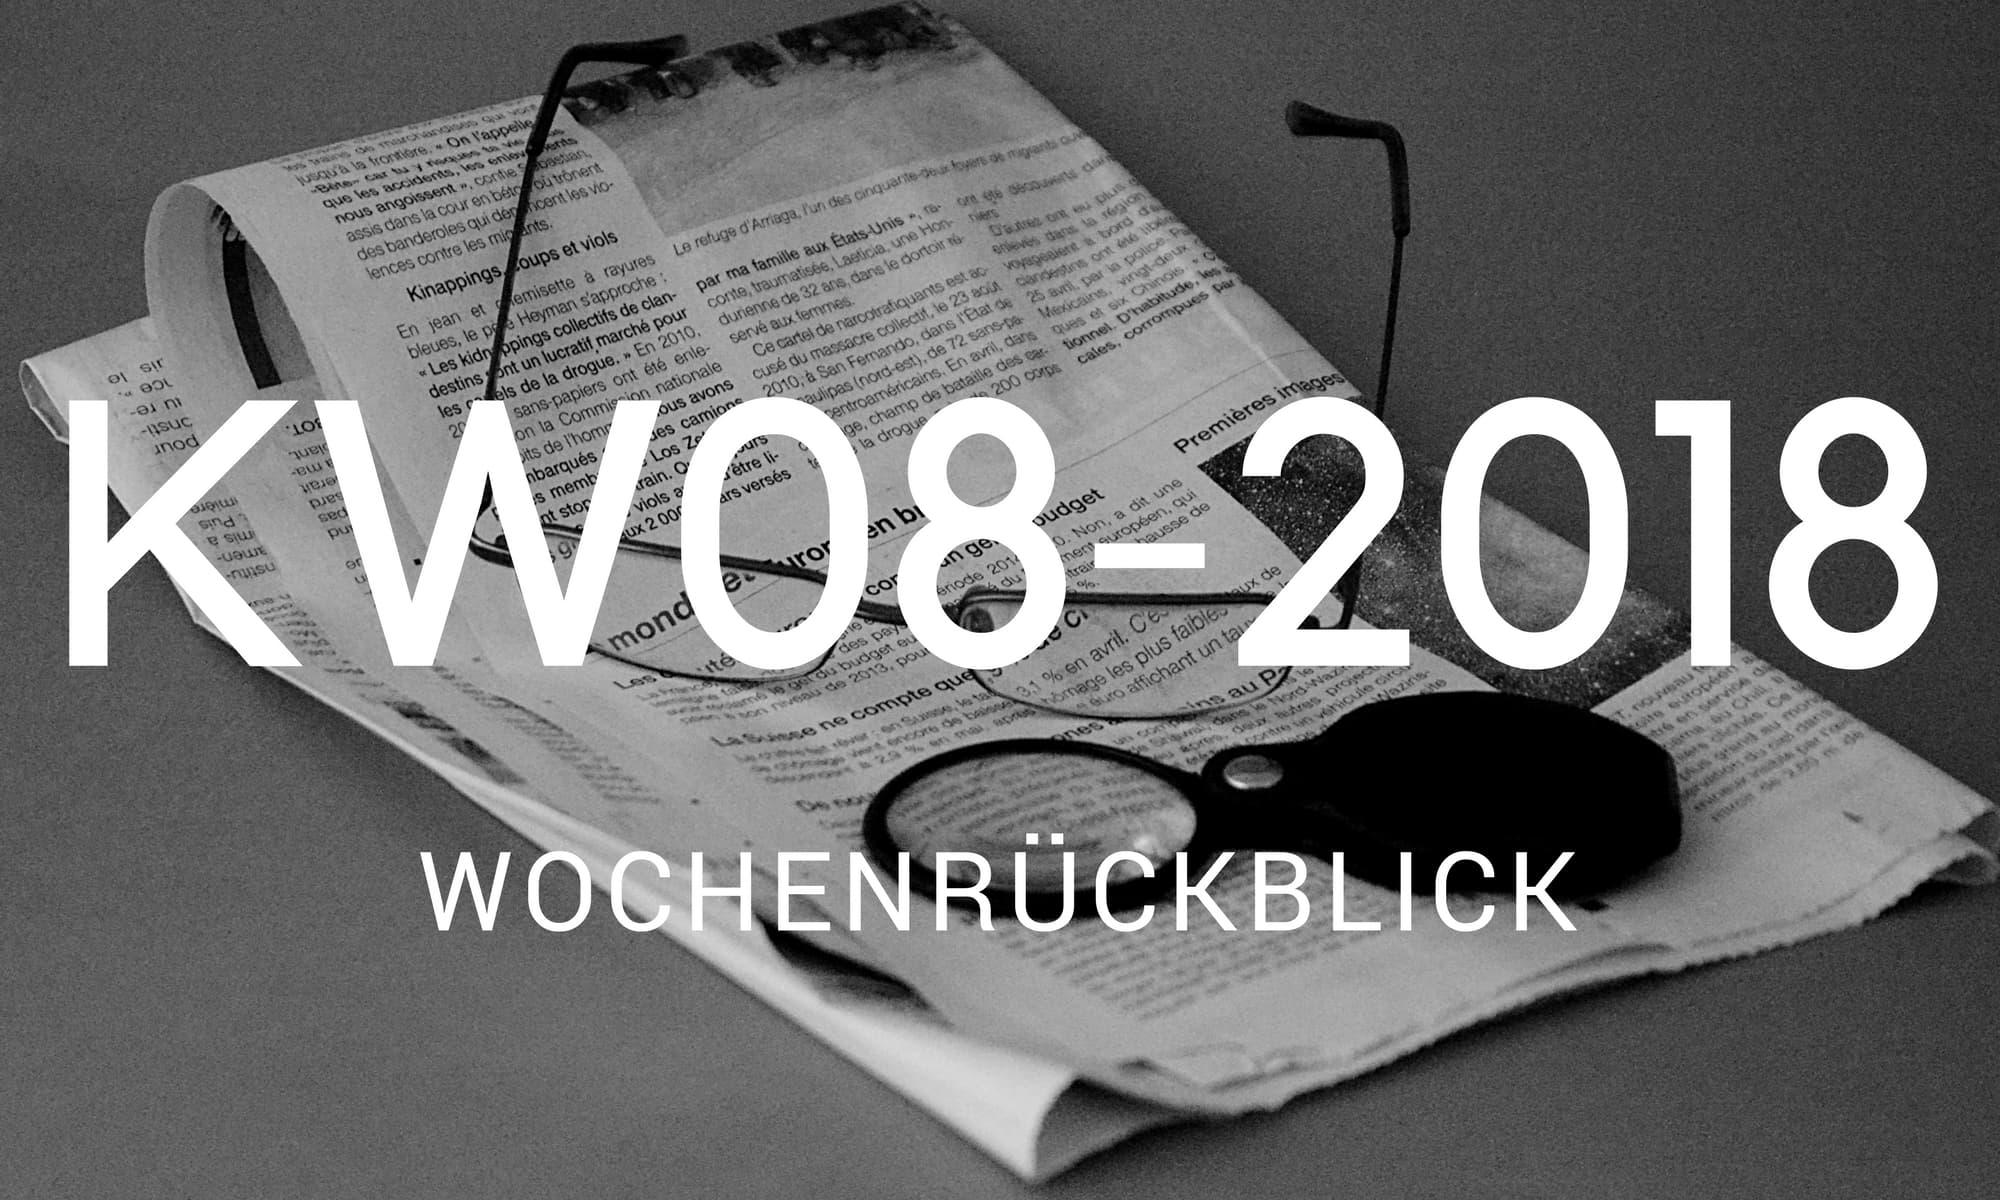 wochenrueckblick camping news KW08-2018